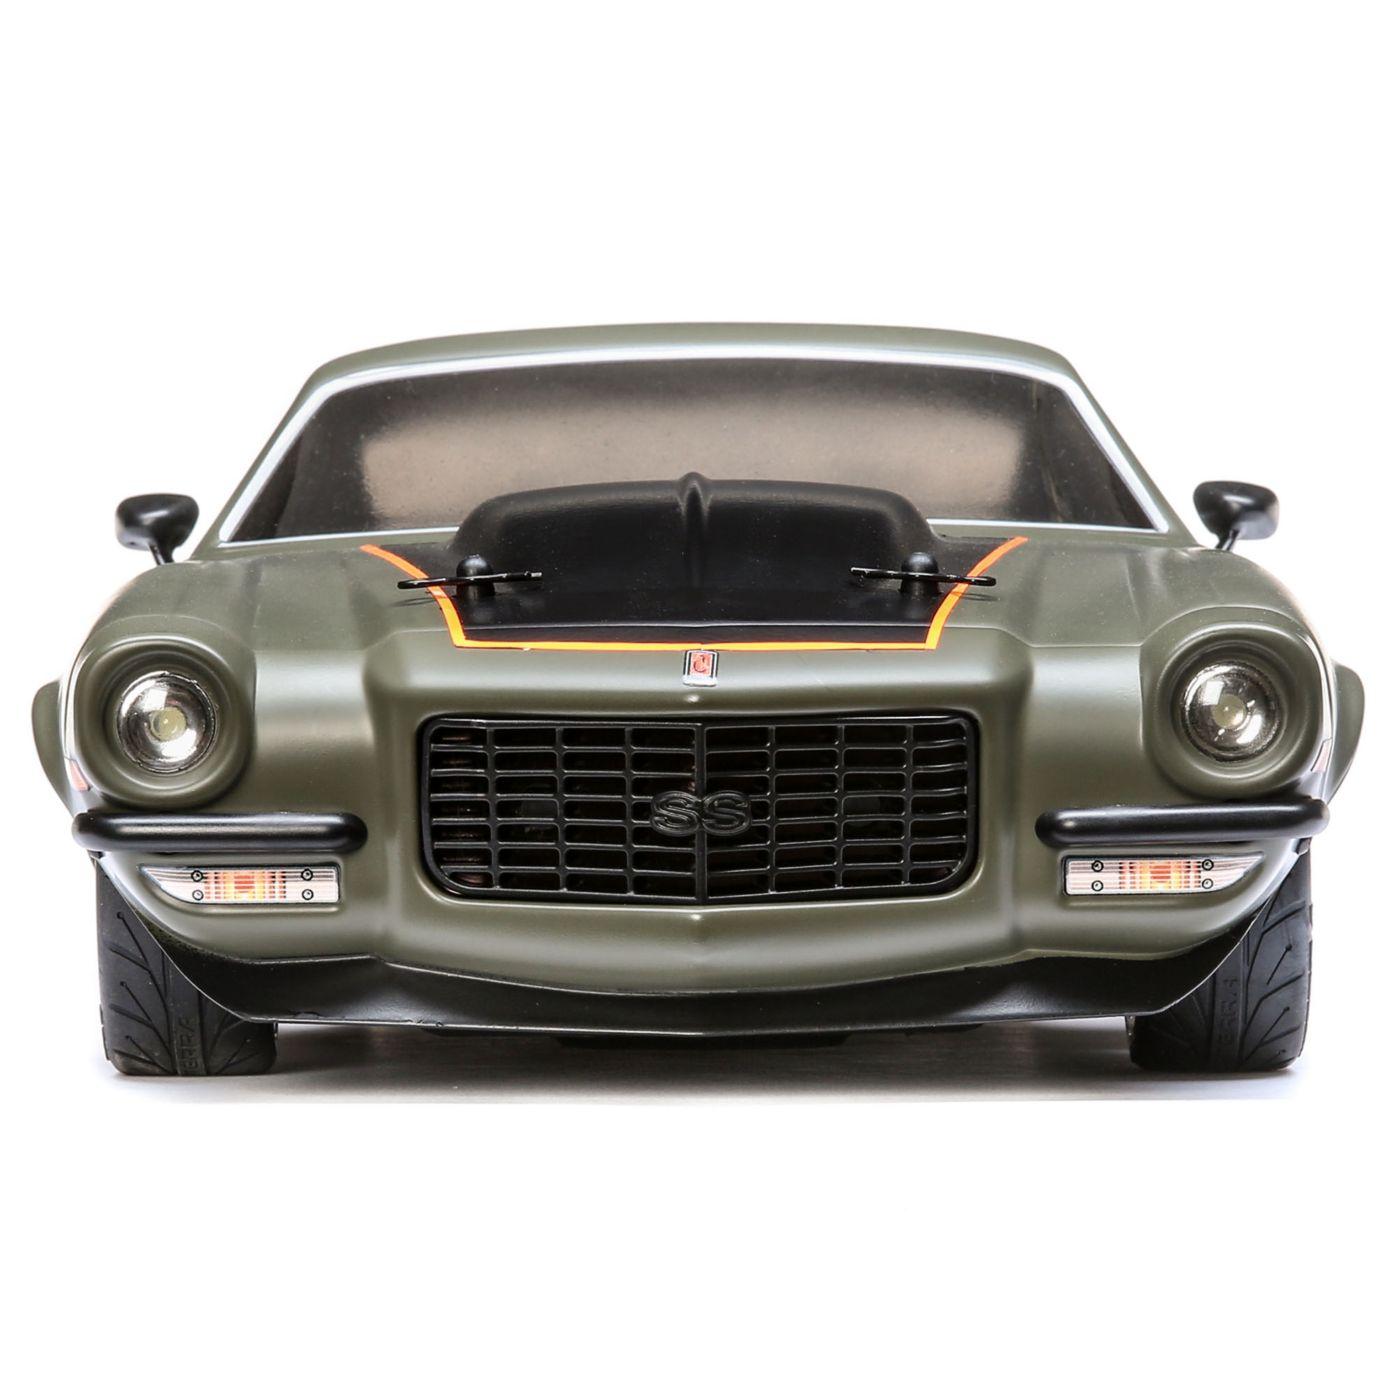 Vaterra 1972 Camaro SS - Front